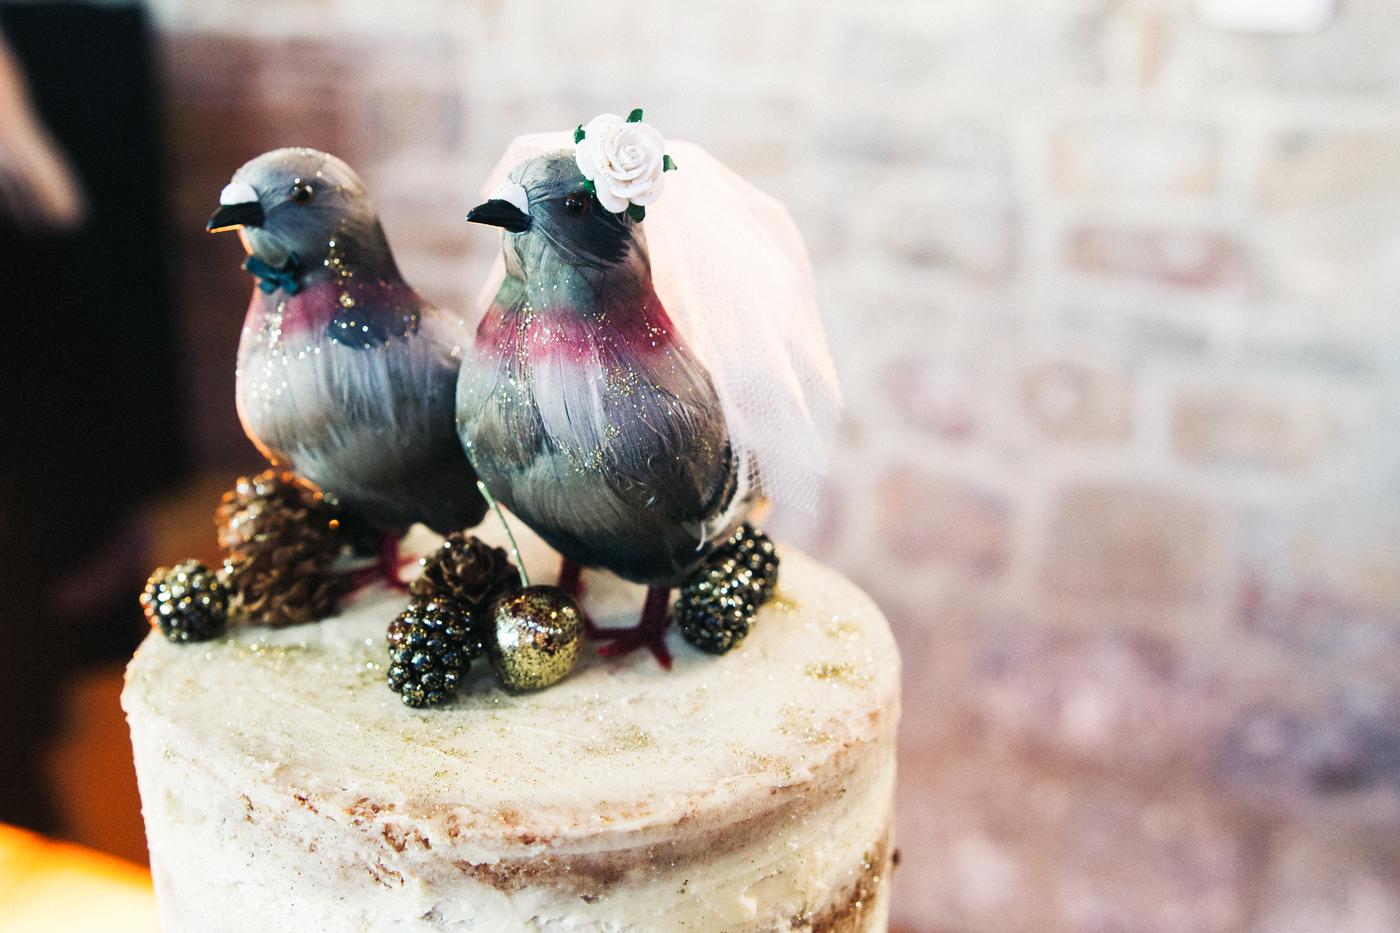 teesside-middlesbrough-north-east-wedding-photographer-creative-wedding-venues-0024.jpg